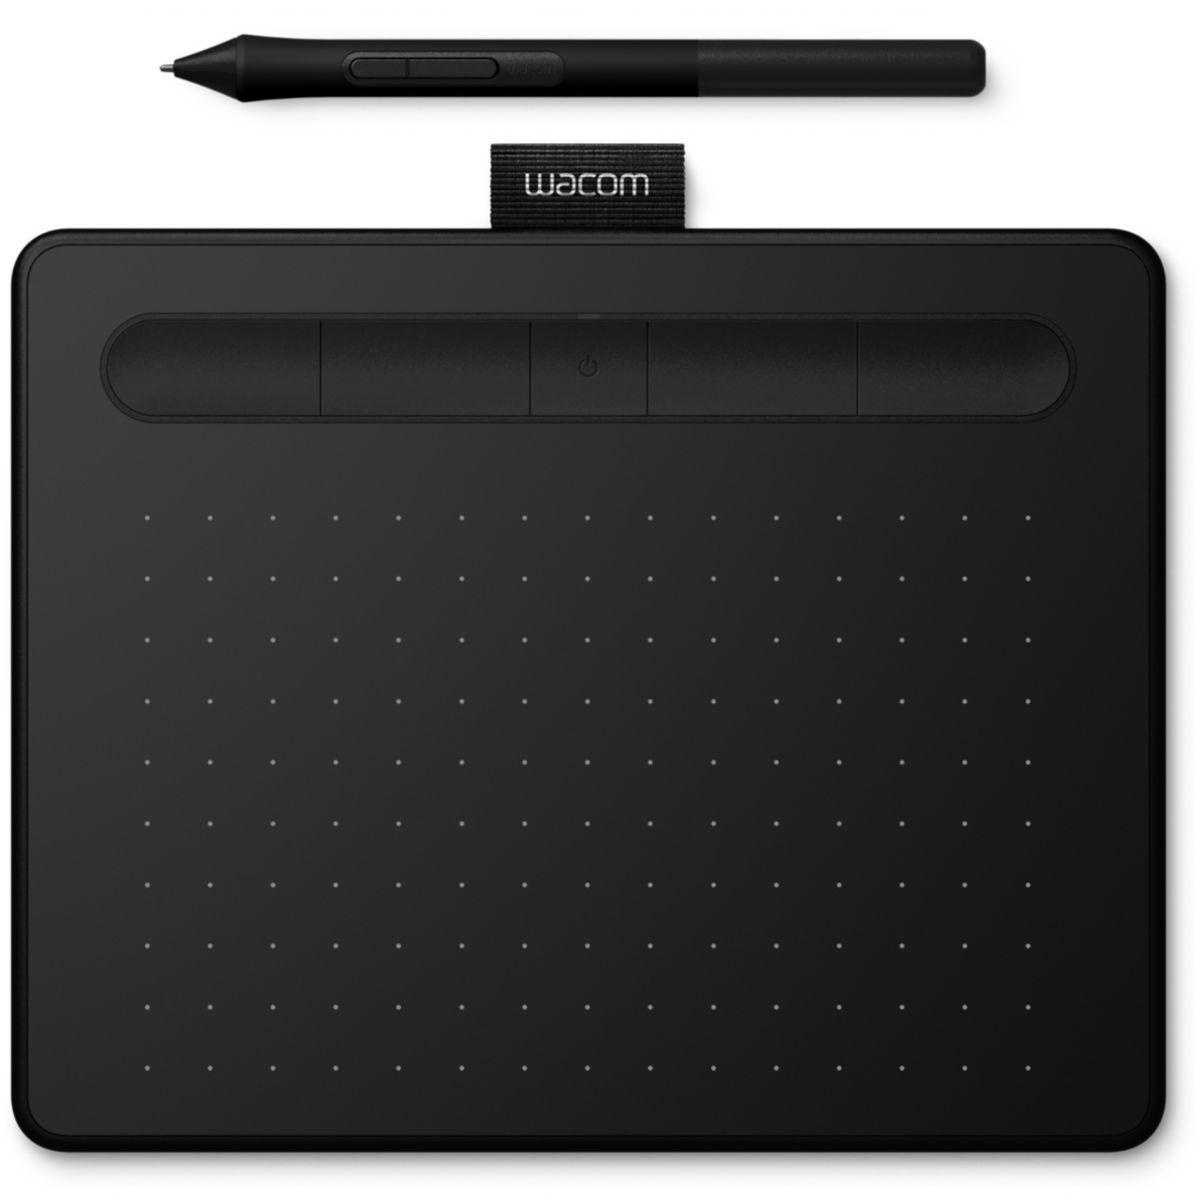 Tablette graph wacom intuos bluetooth in - livraison offerte : code liv